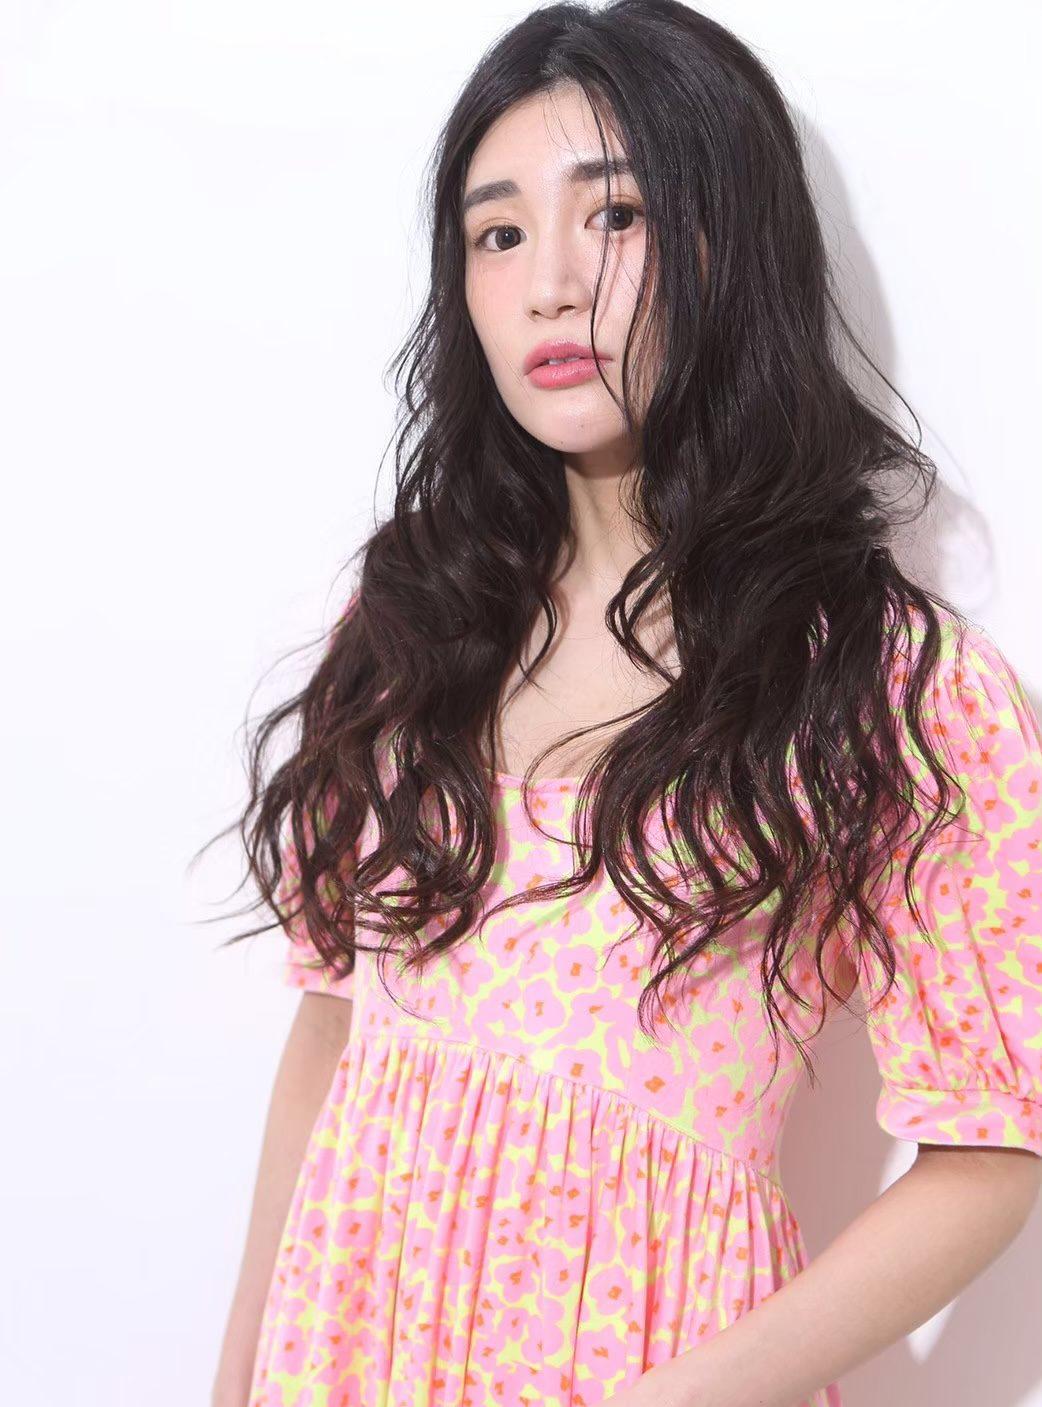 【SWEET♪】女子力高めな重めロングウェーブ☆★